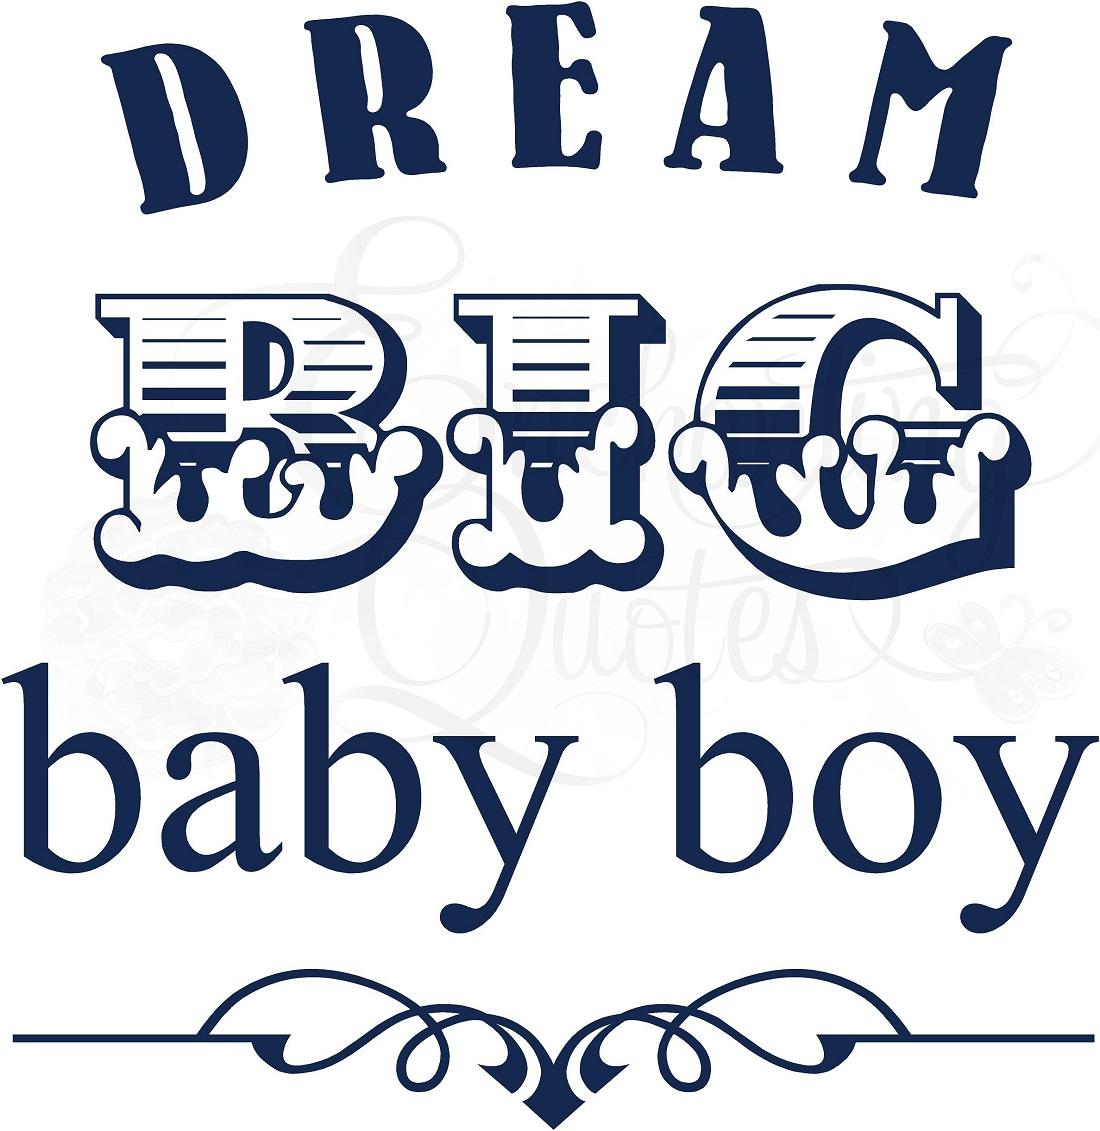 Baby Boy Quotes. QuotesGram